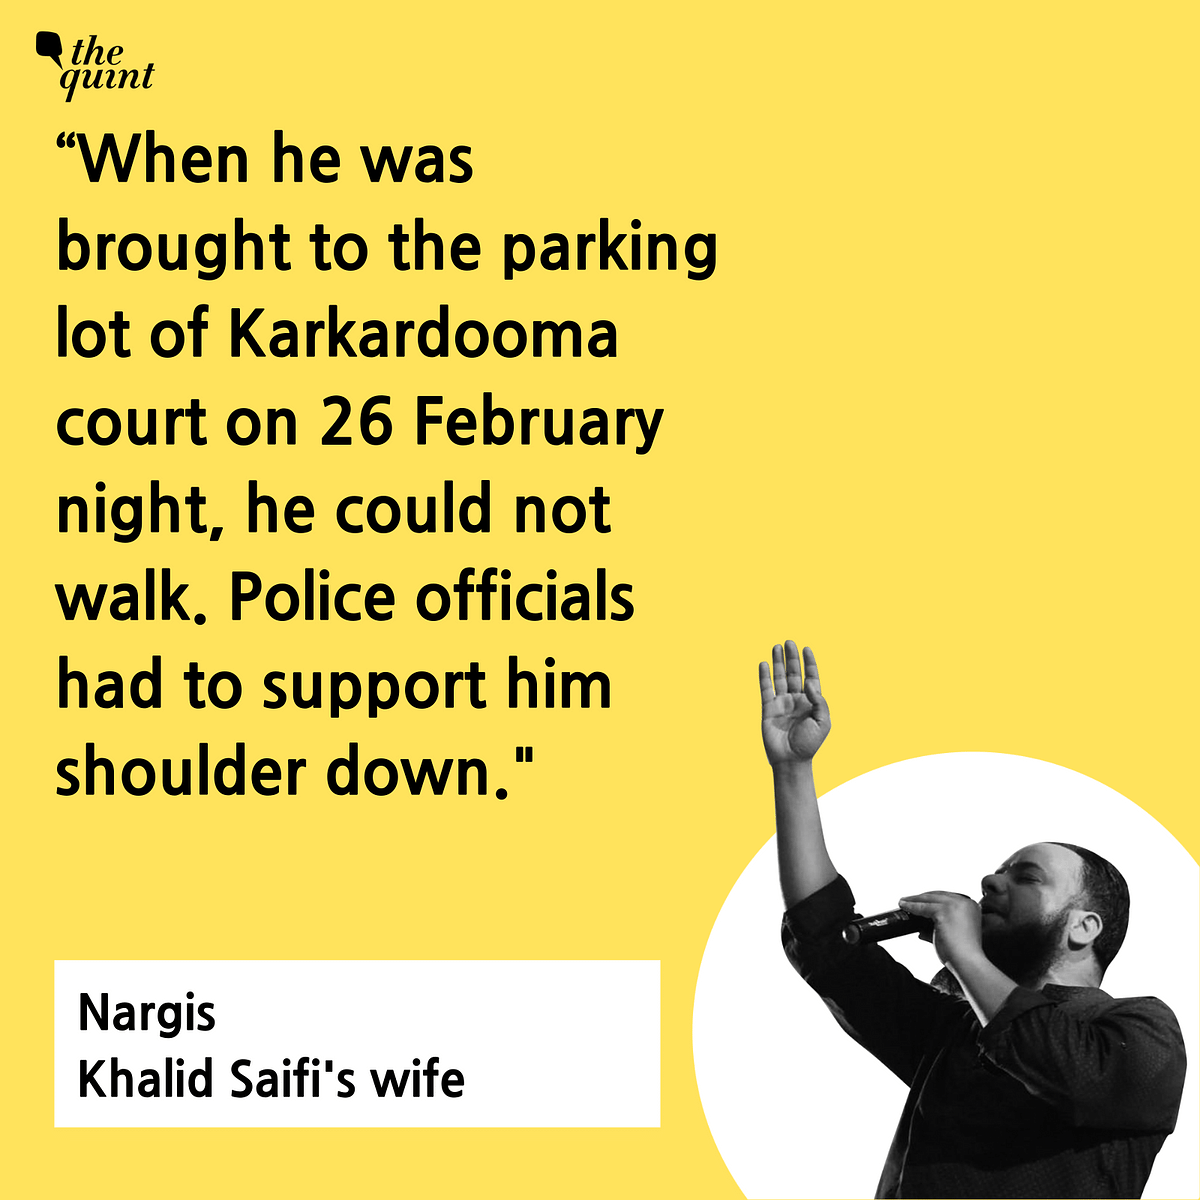 Delhi Riots: Six Months After 'Torture', Khalid Saifi Awaits Bail